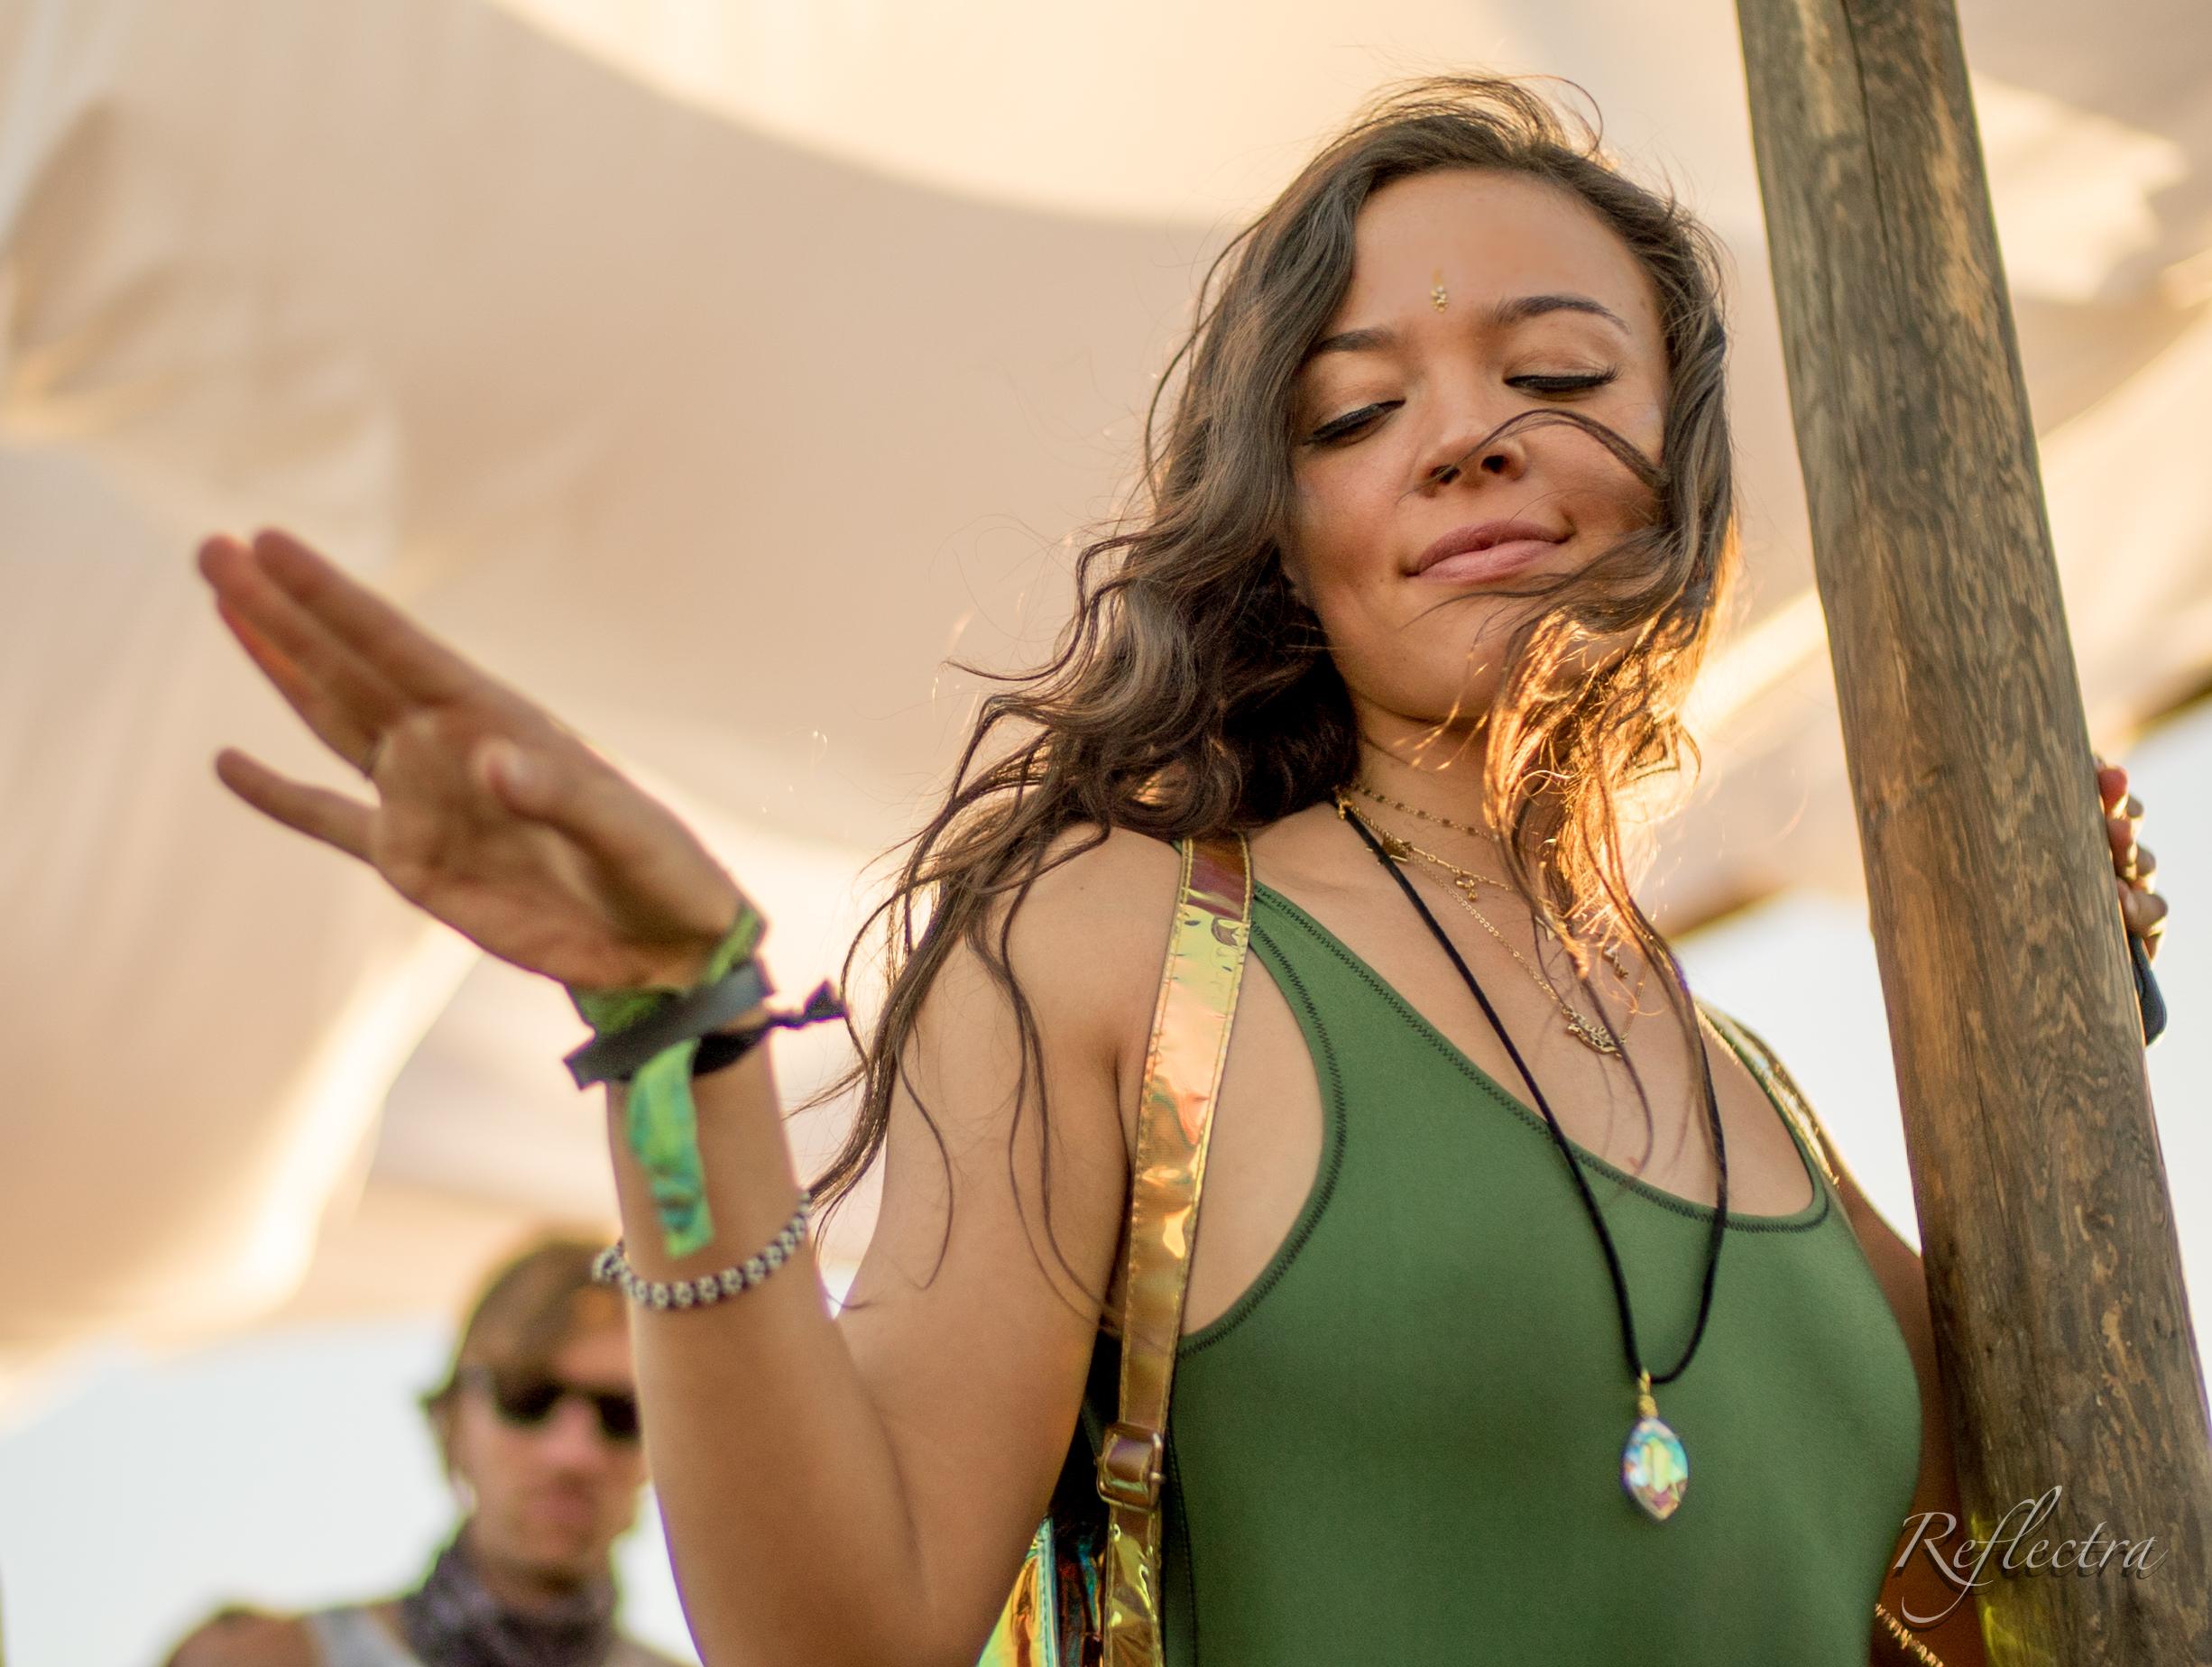 reflectra love festival -4